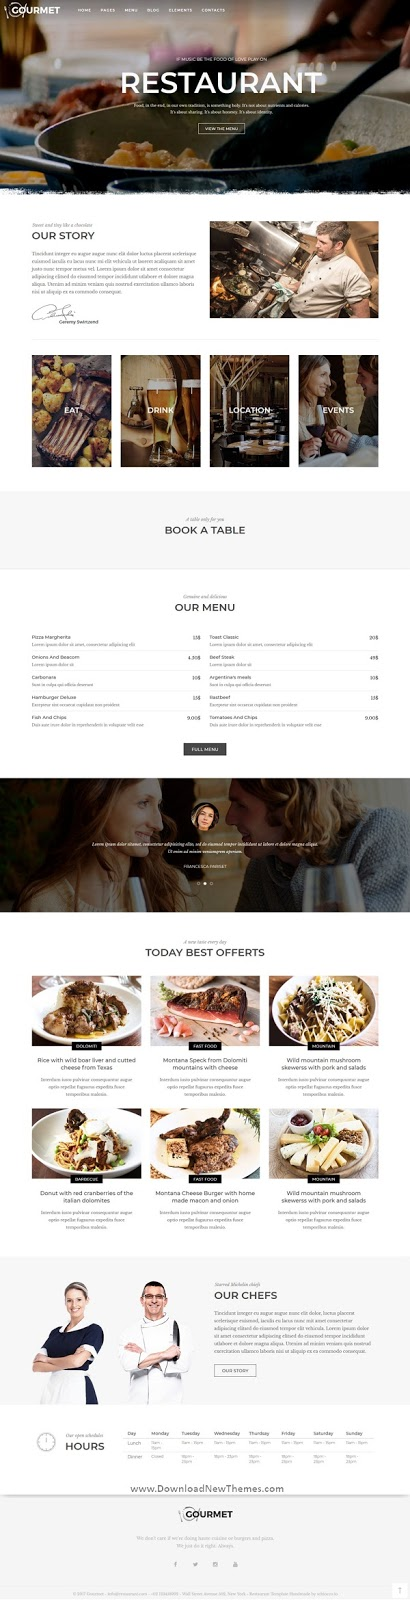 Restaurant and Food Joomla Template